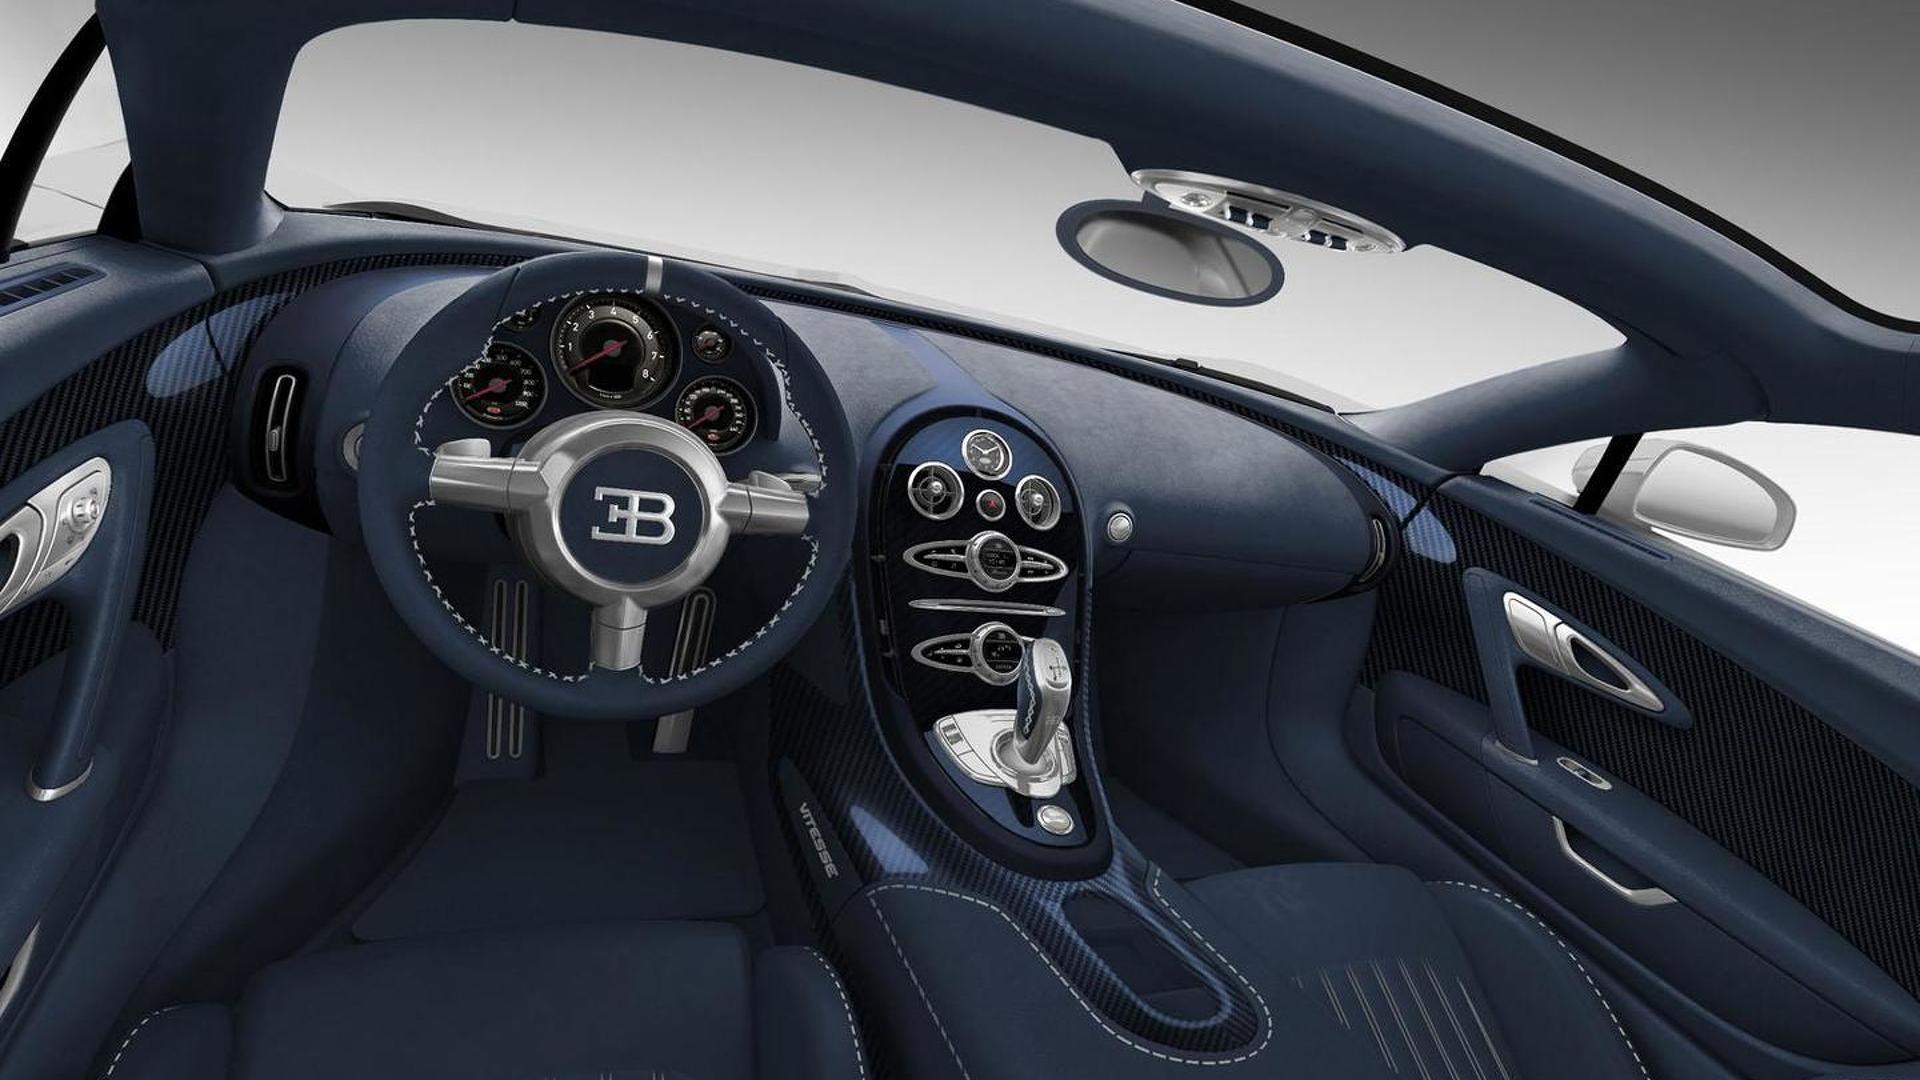 2012-339916-bugatti-veyron-16-4-grand-sport-vitesse-rafale-special-edition-22-10-20121 Fabulous 2012 Bugatti Veyron Grand Sport Vitesse Specs Cars Trend